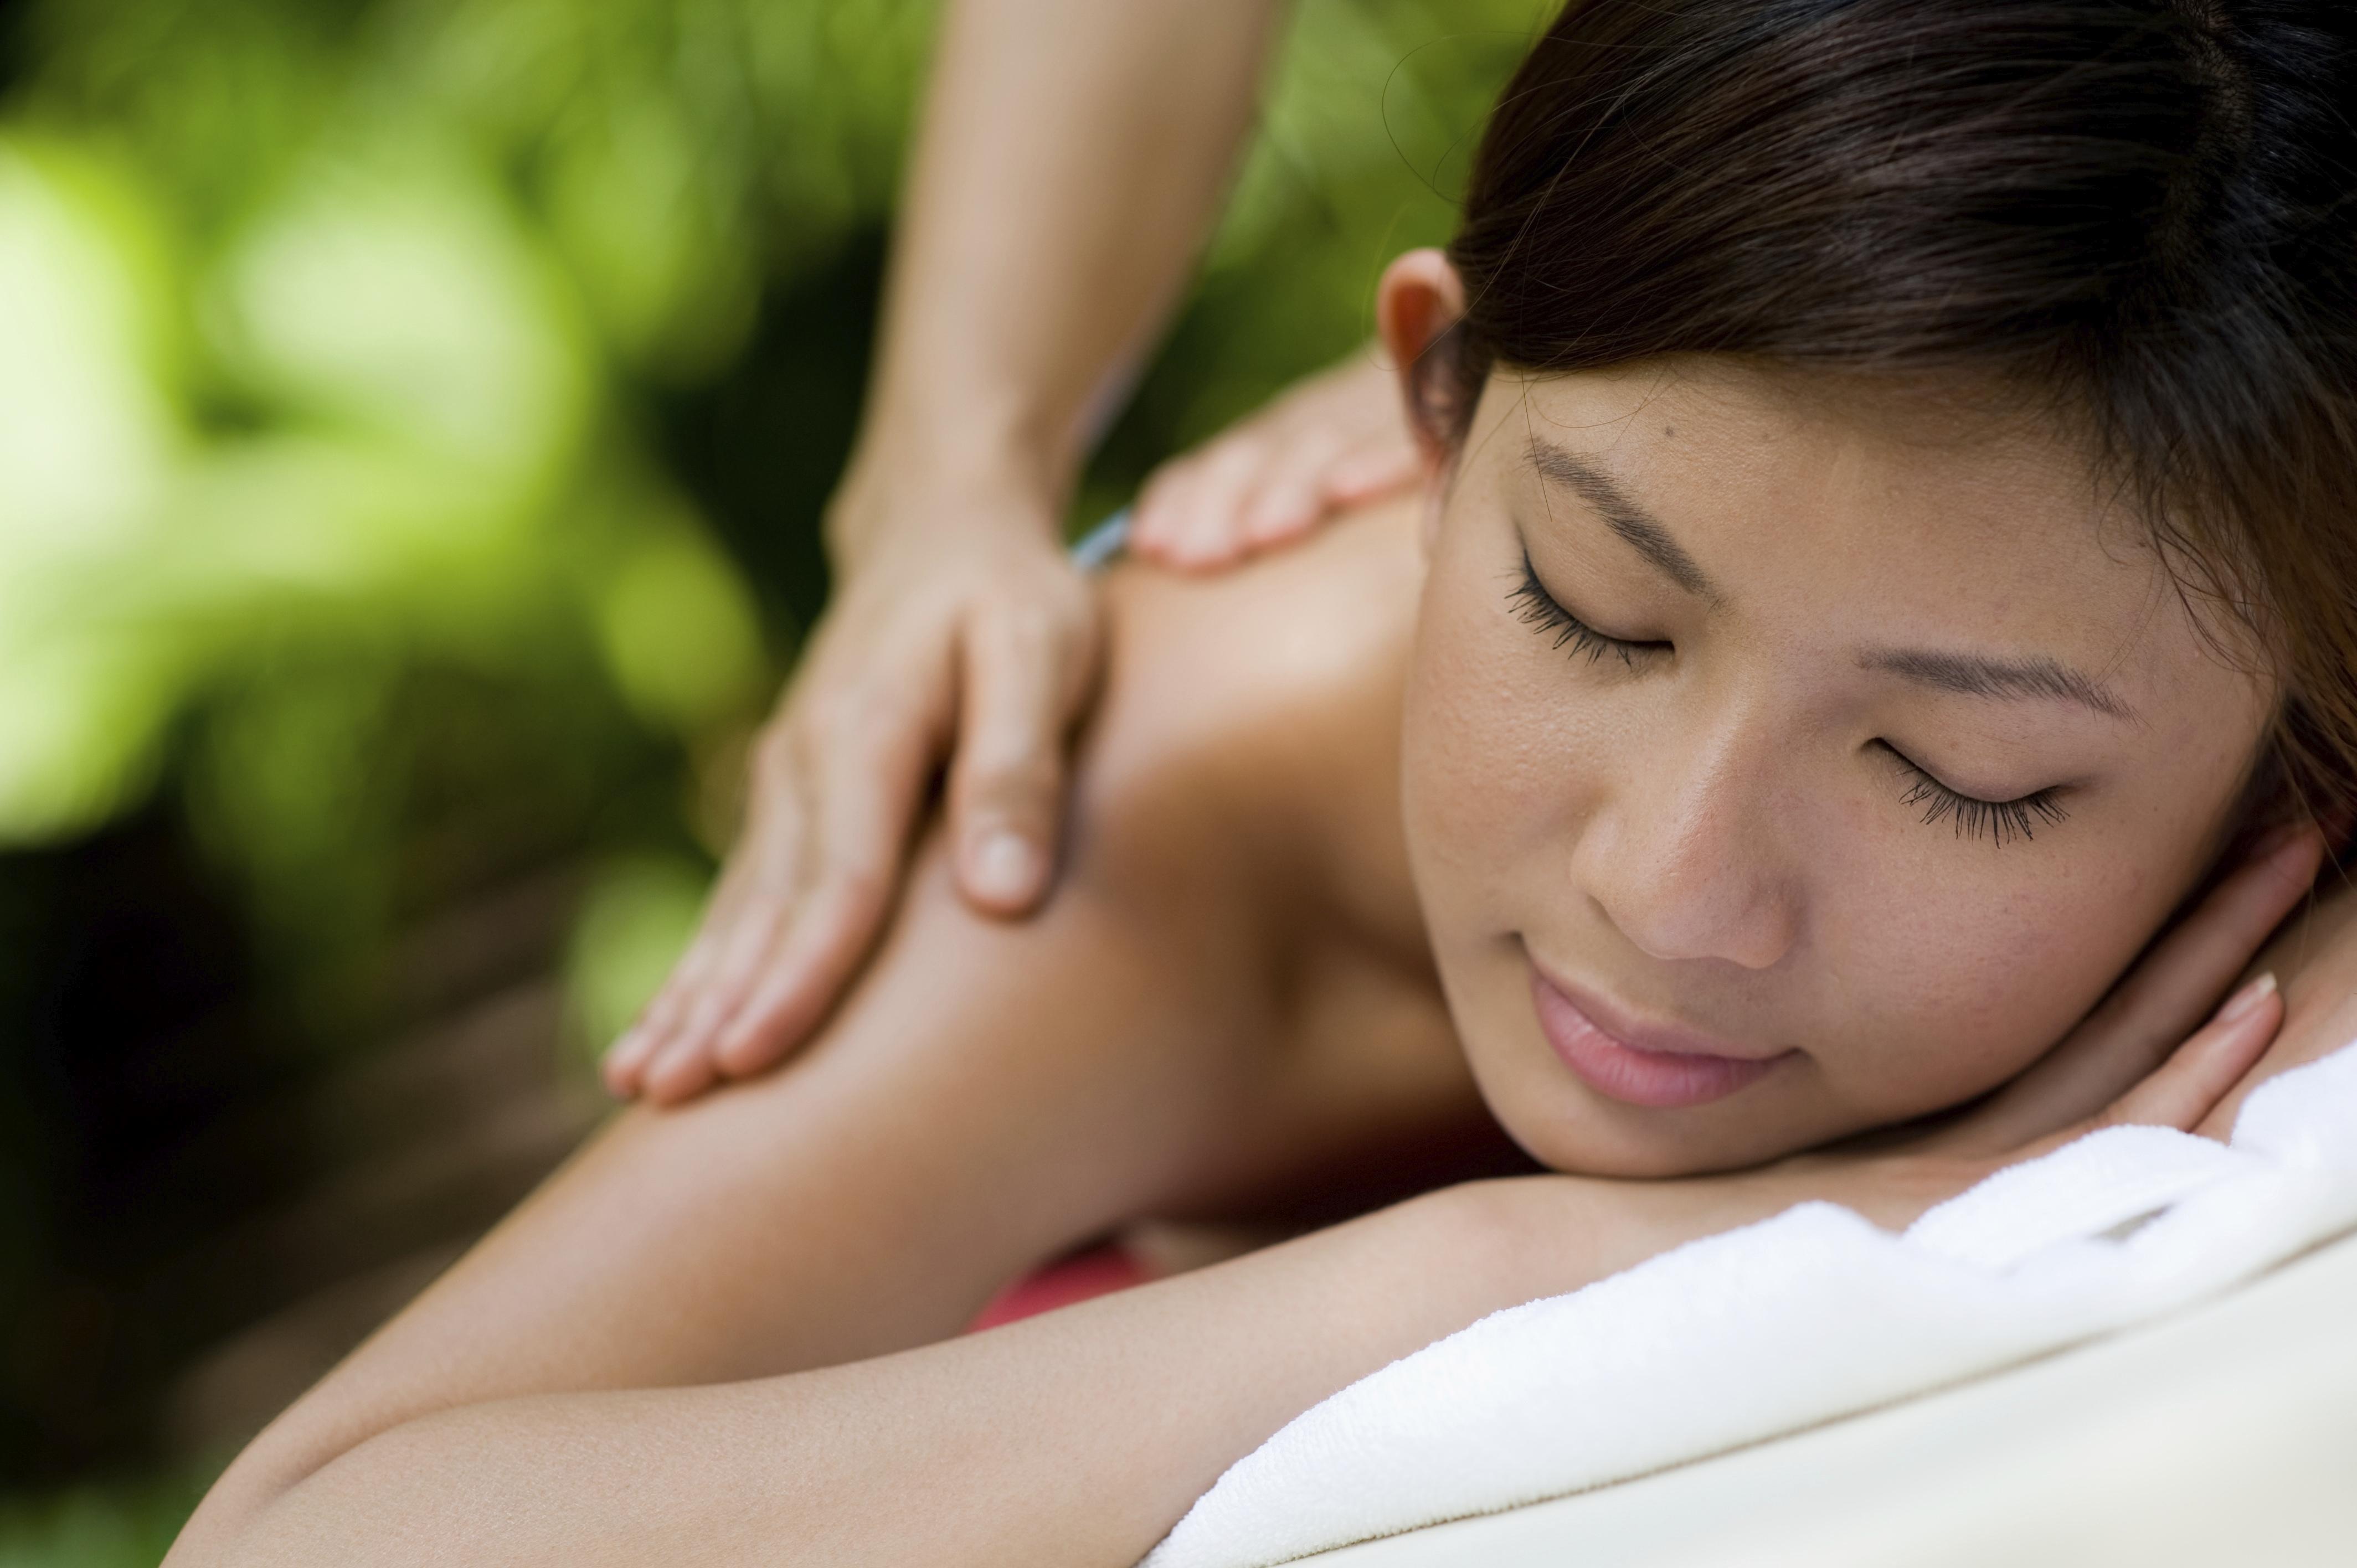 massage kjellerup buddinge thai